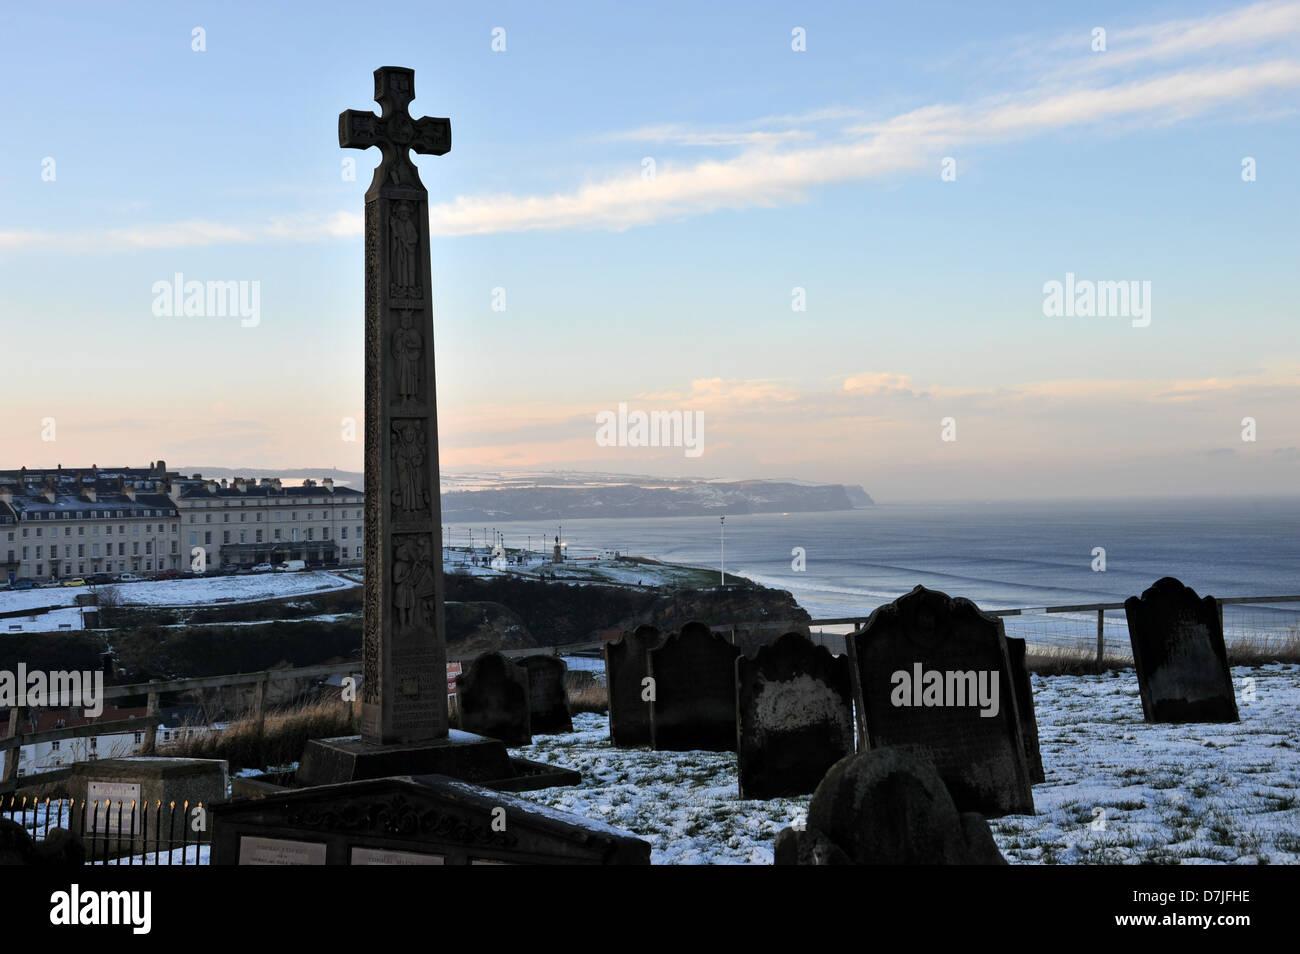 whitby graveyard,cross,wintery scene,cliffs, sea,gravestones,town,coastline,town,north seablue skies,cliffs,snow - Stock Image